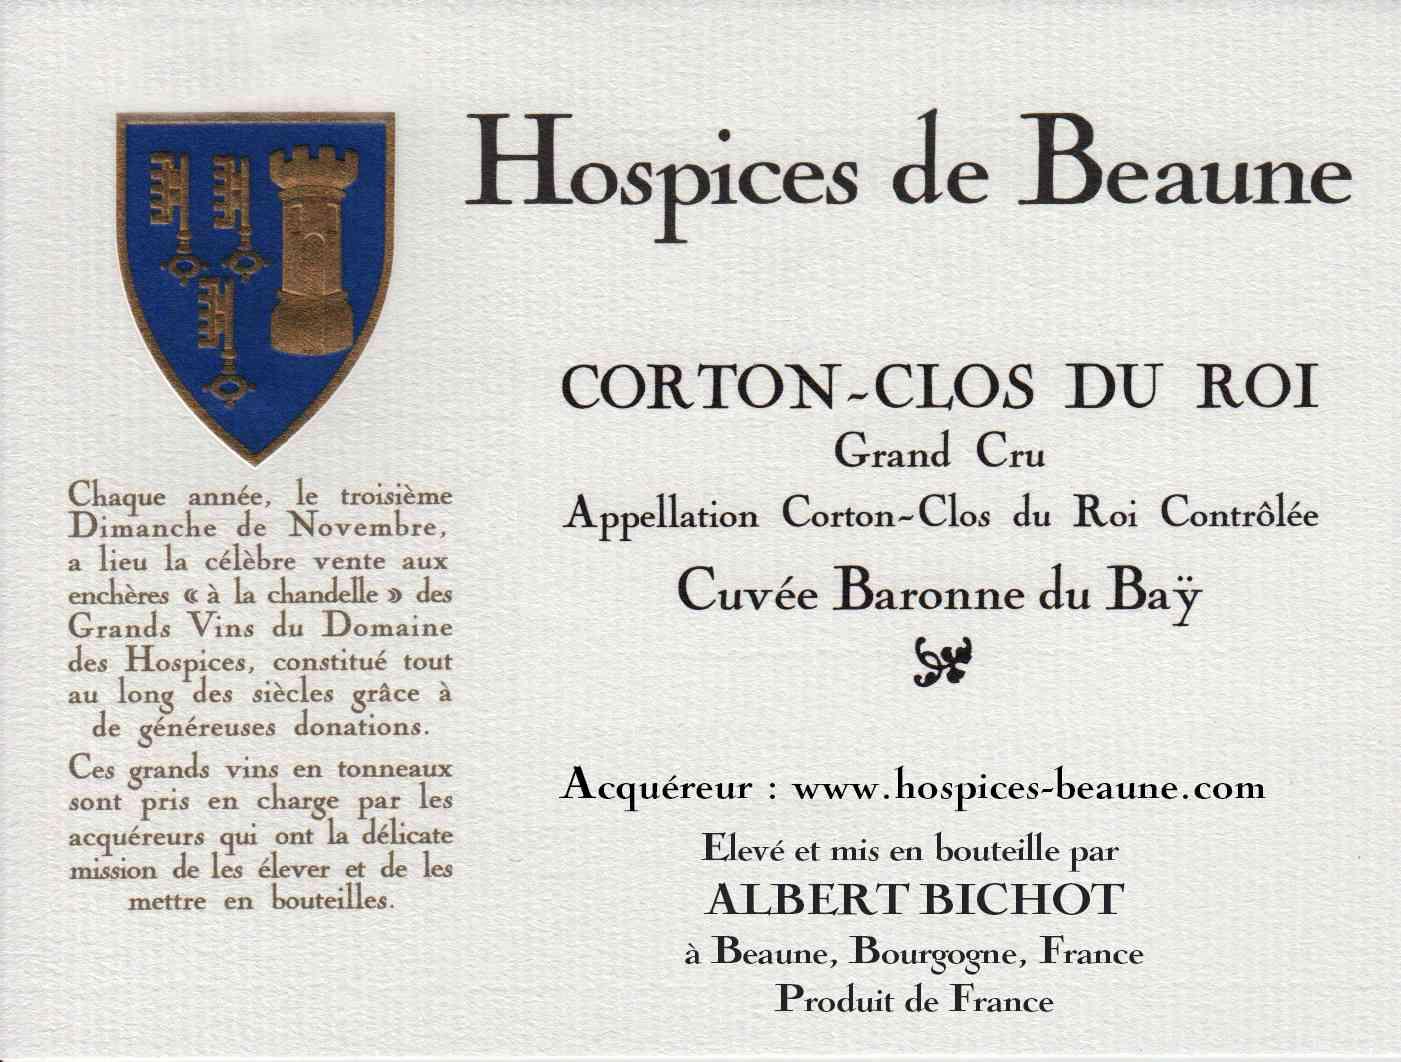 Encheres-auction-HospicesdeBeaune-AlbertBichot-CortonClosduRoy-GrandCru-Cuvee-BaronneduBay